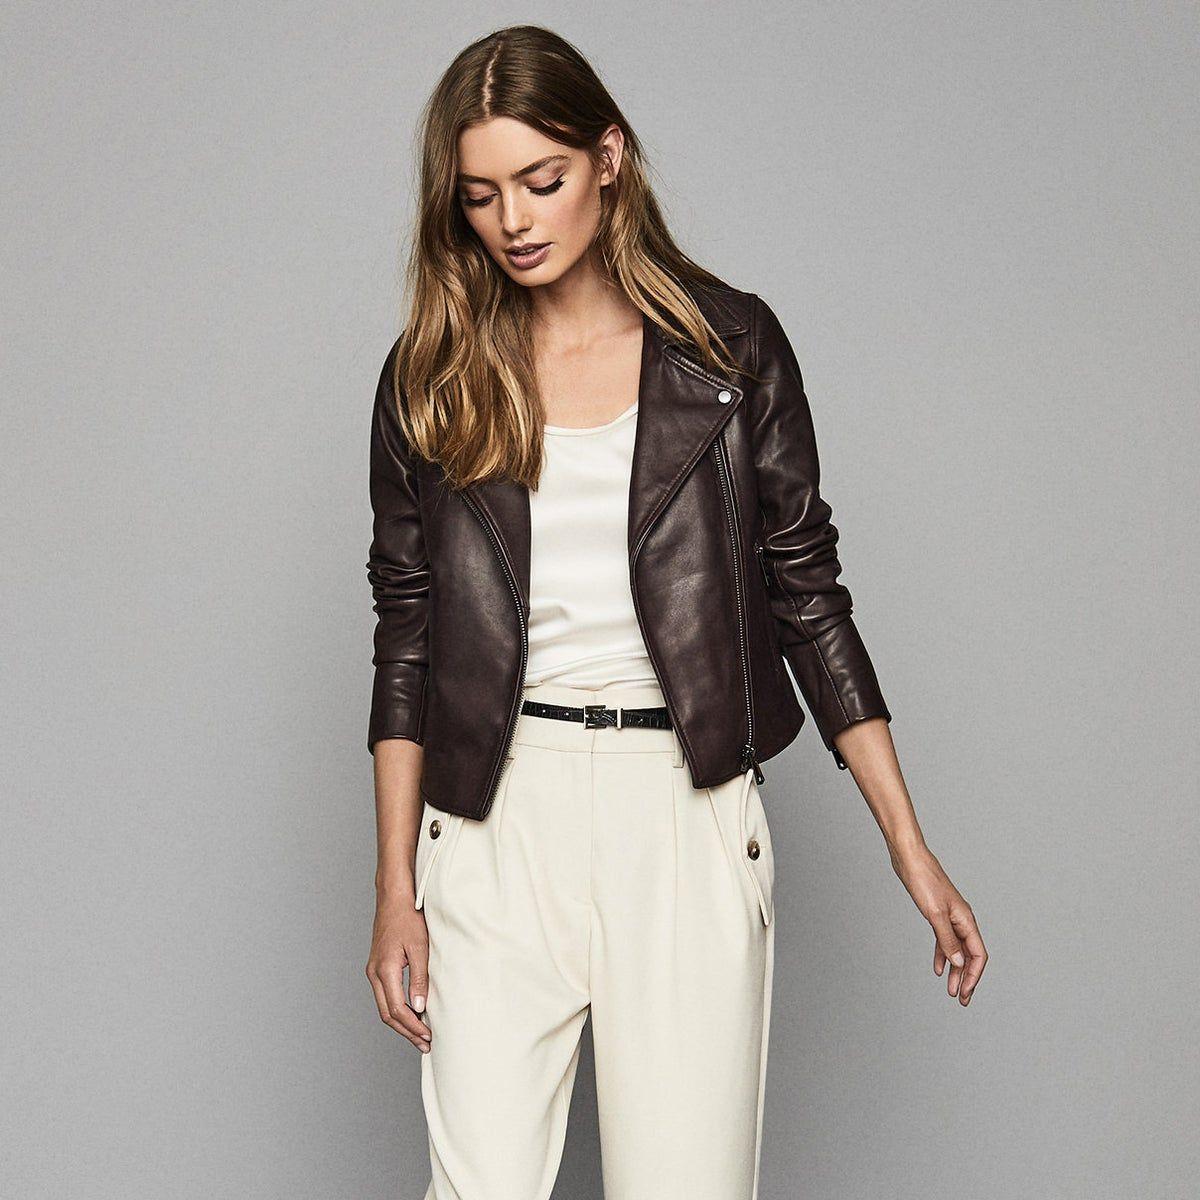 Geo Oxblood Leather Biker Jacket Reiss Trendy Fashion Outfits Womens Leather Biker Jacket Trendy Outfits [ 1200 x 1200 Pixel ]